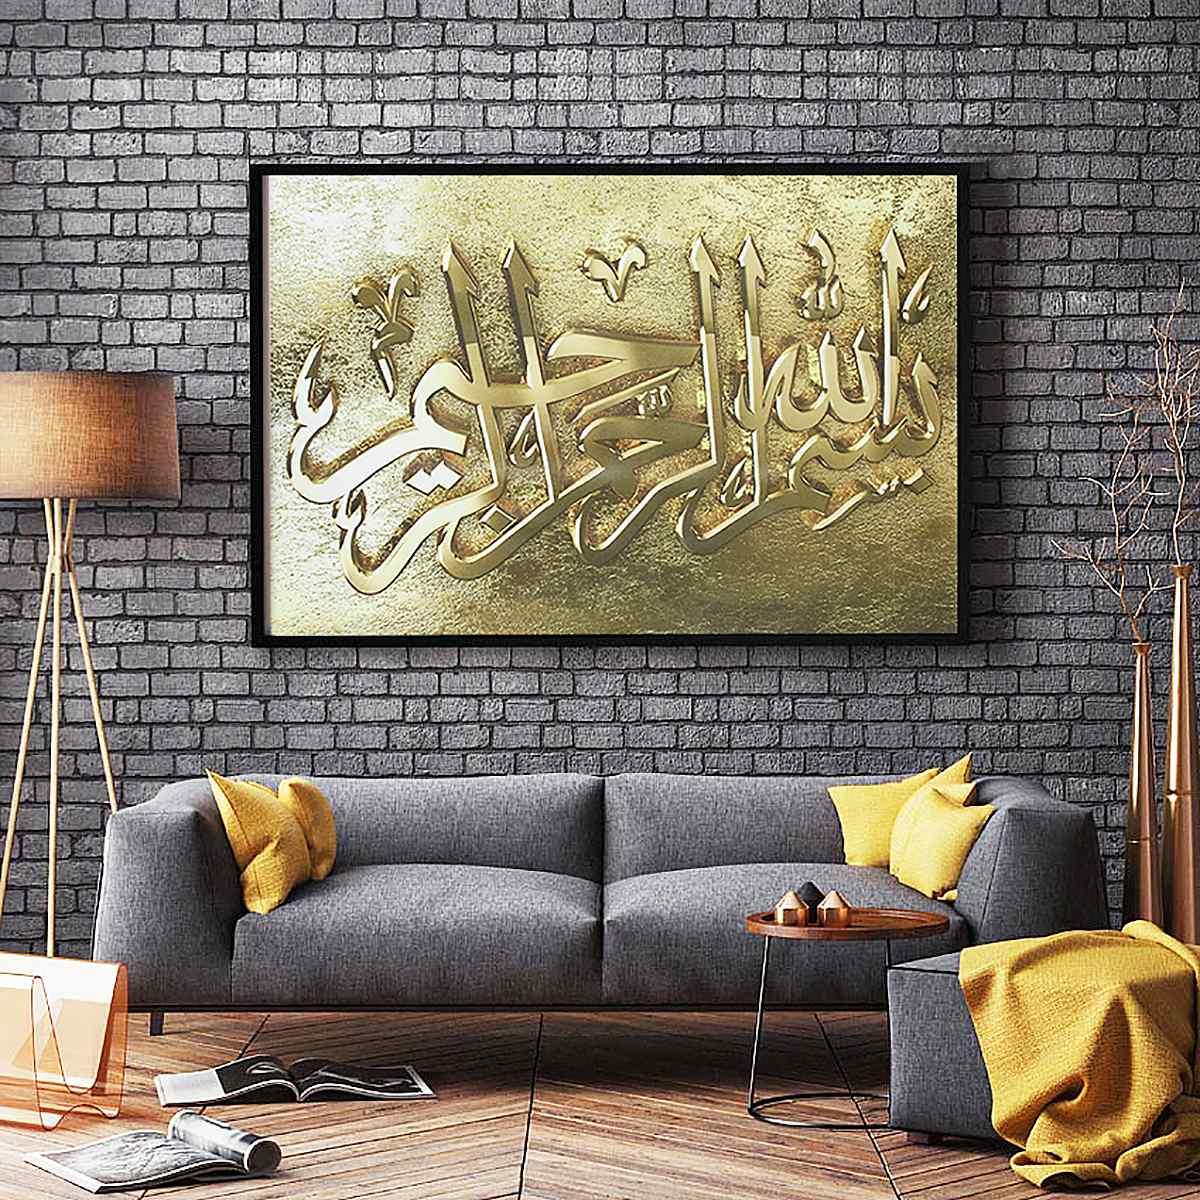 Dubai Gold Arches Mosque #5 Photo Islamic Gallery Wrapped Canvas Art Print Wall Art Ramadan Eid Home Decoration Gift